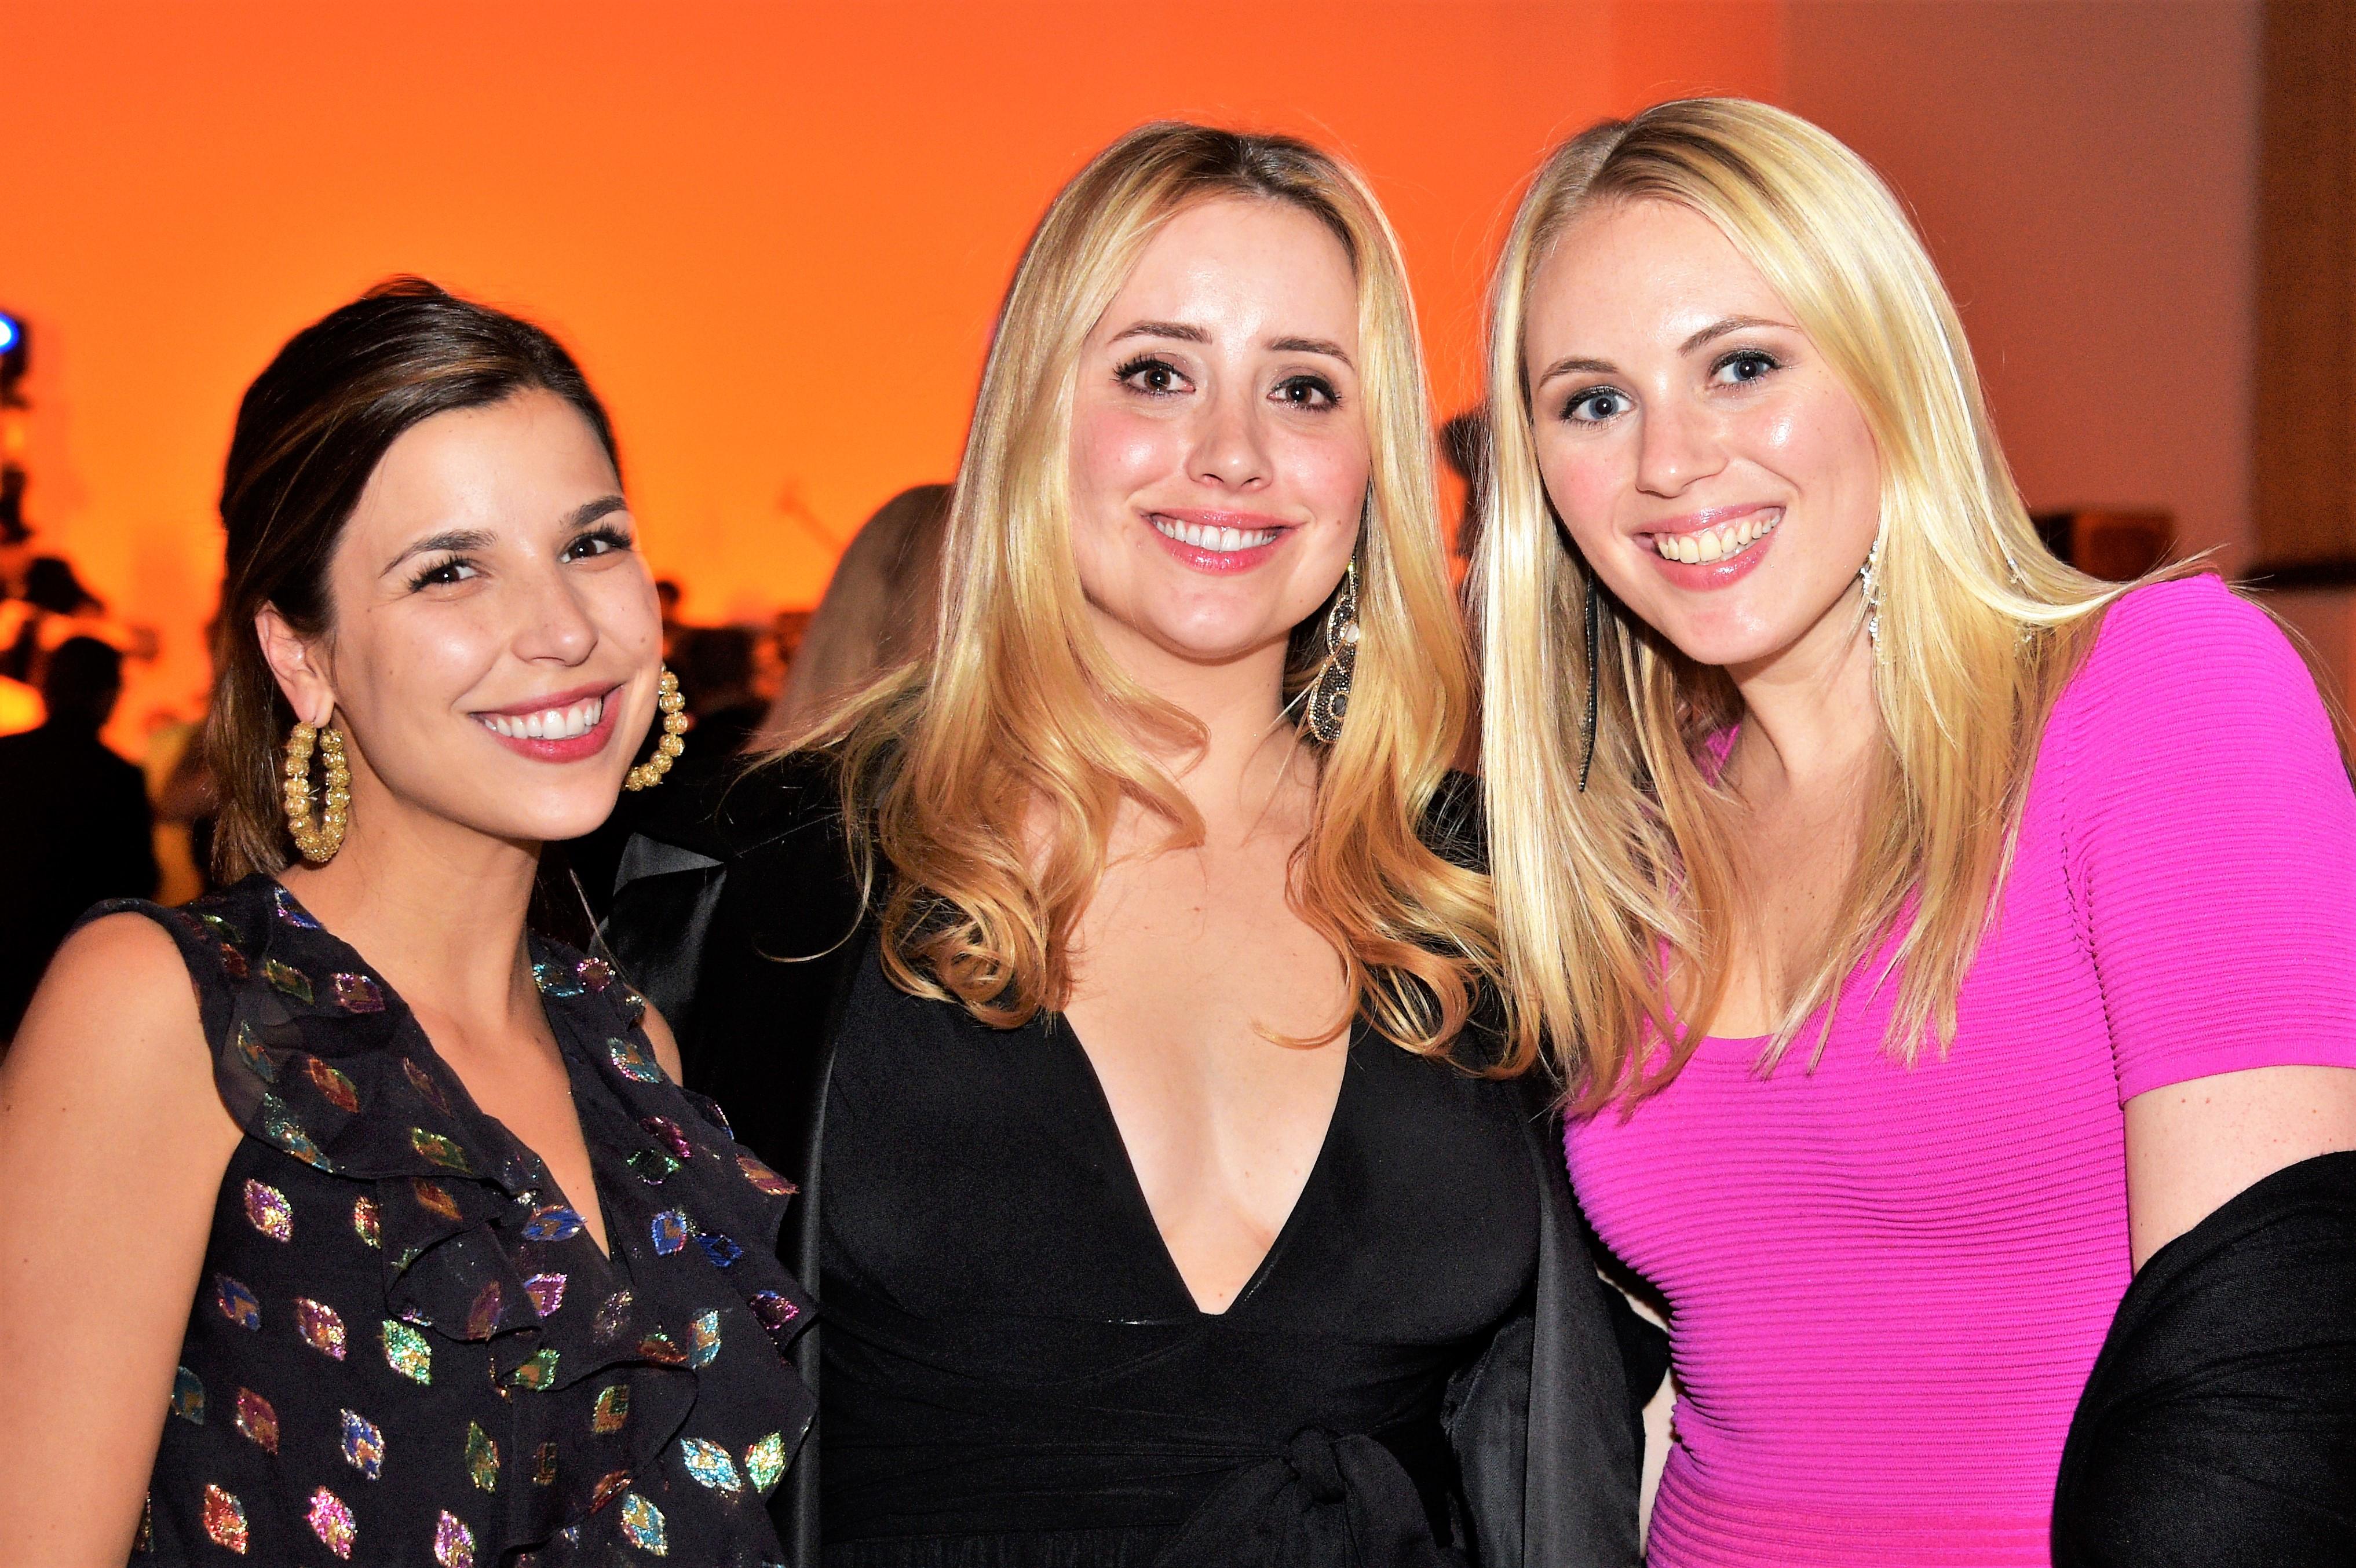 Caroline Renaudin, Sarah Geibel and Sage Blount PG 1 SILHOUETTE